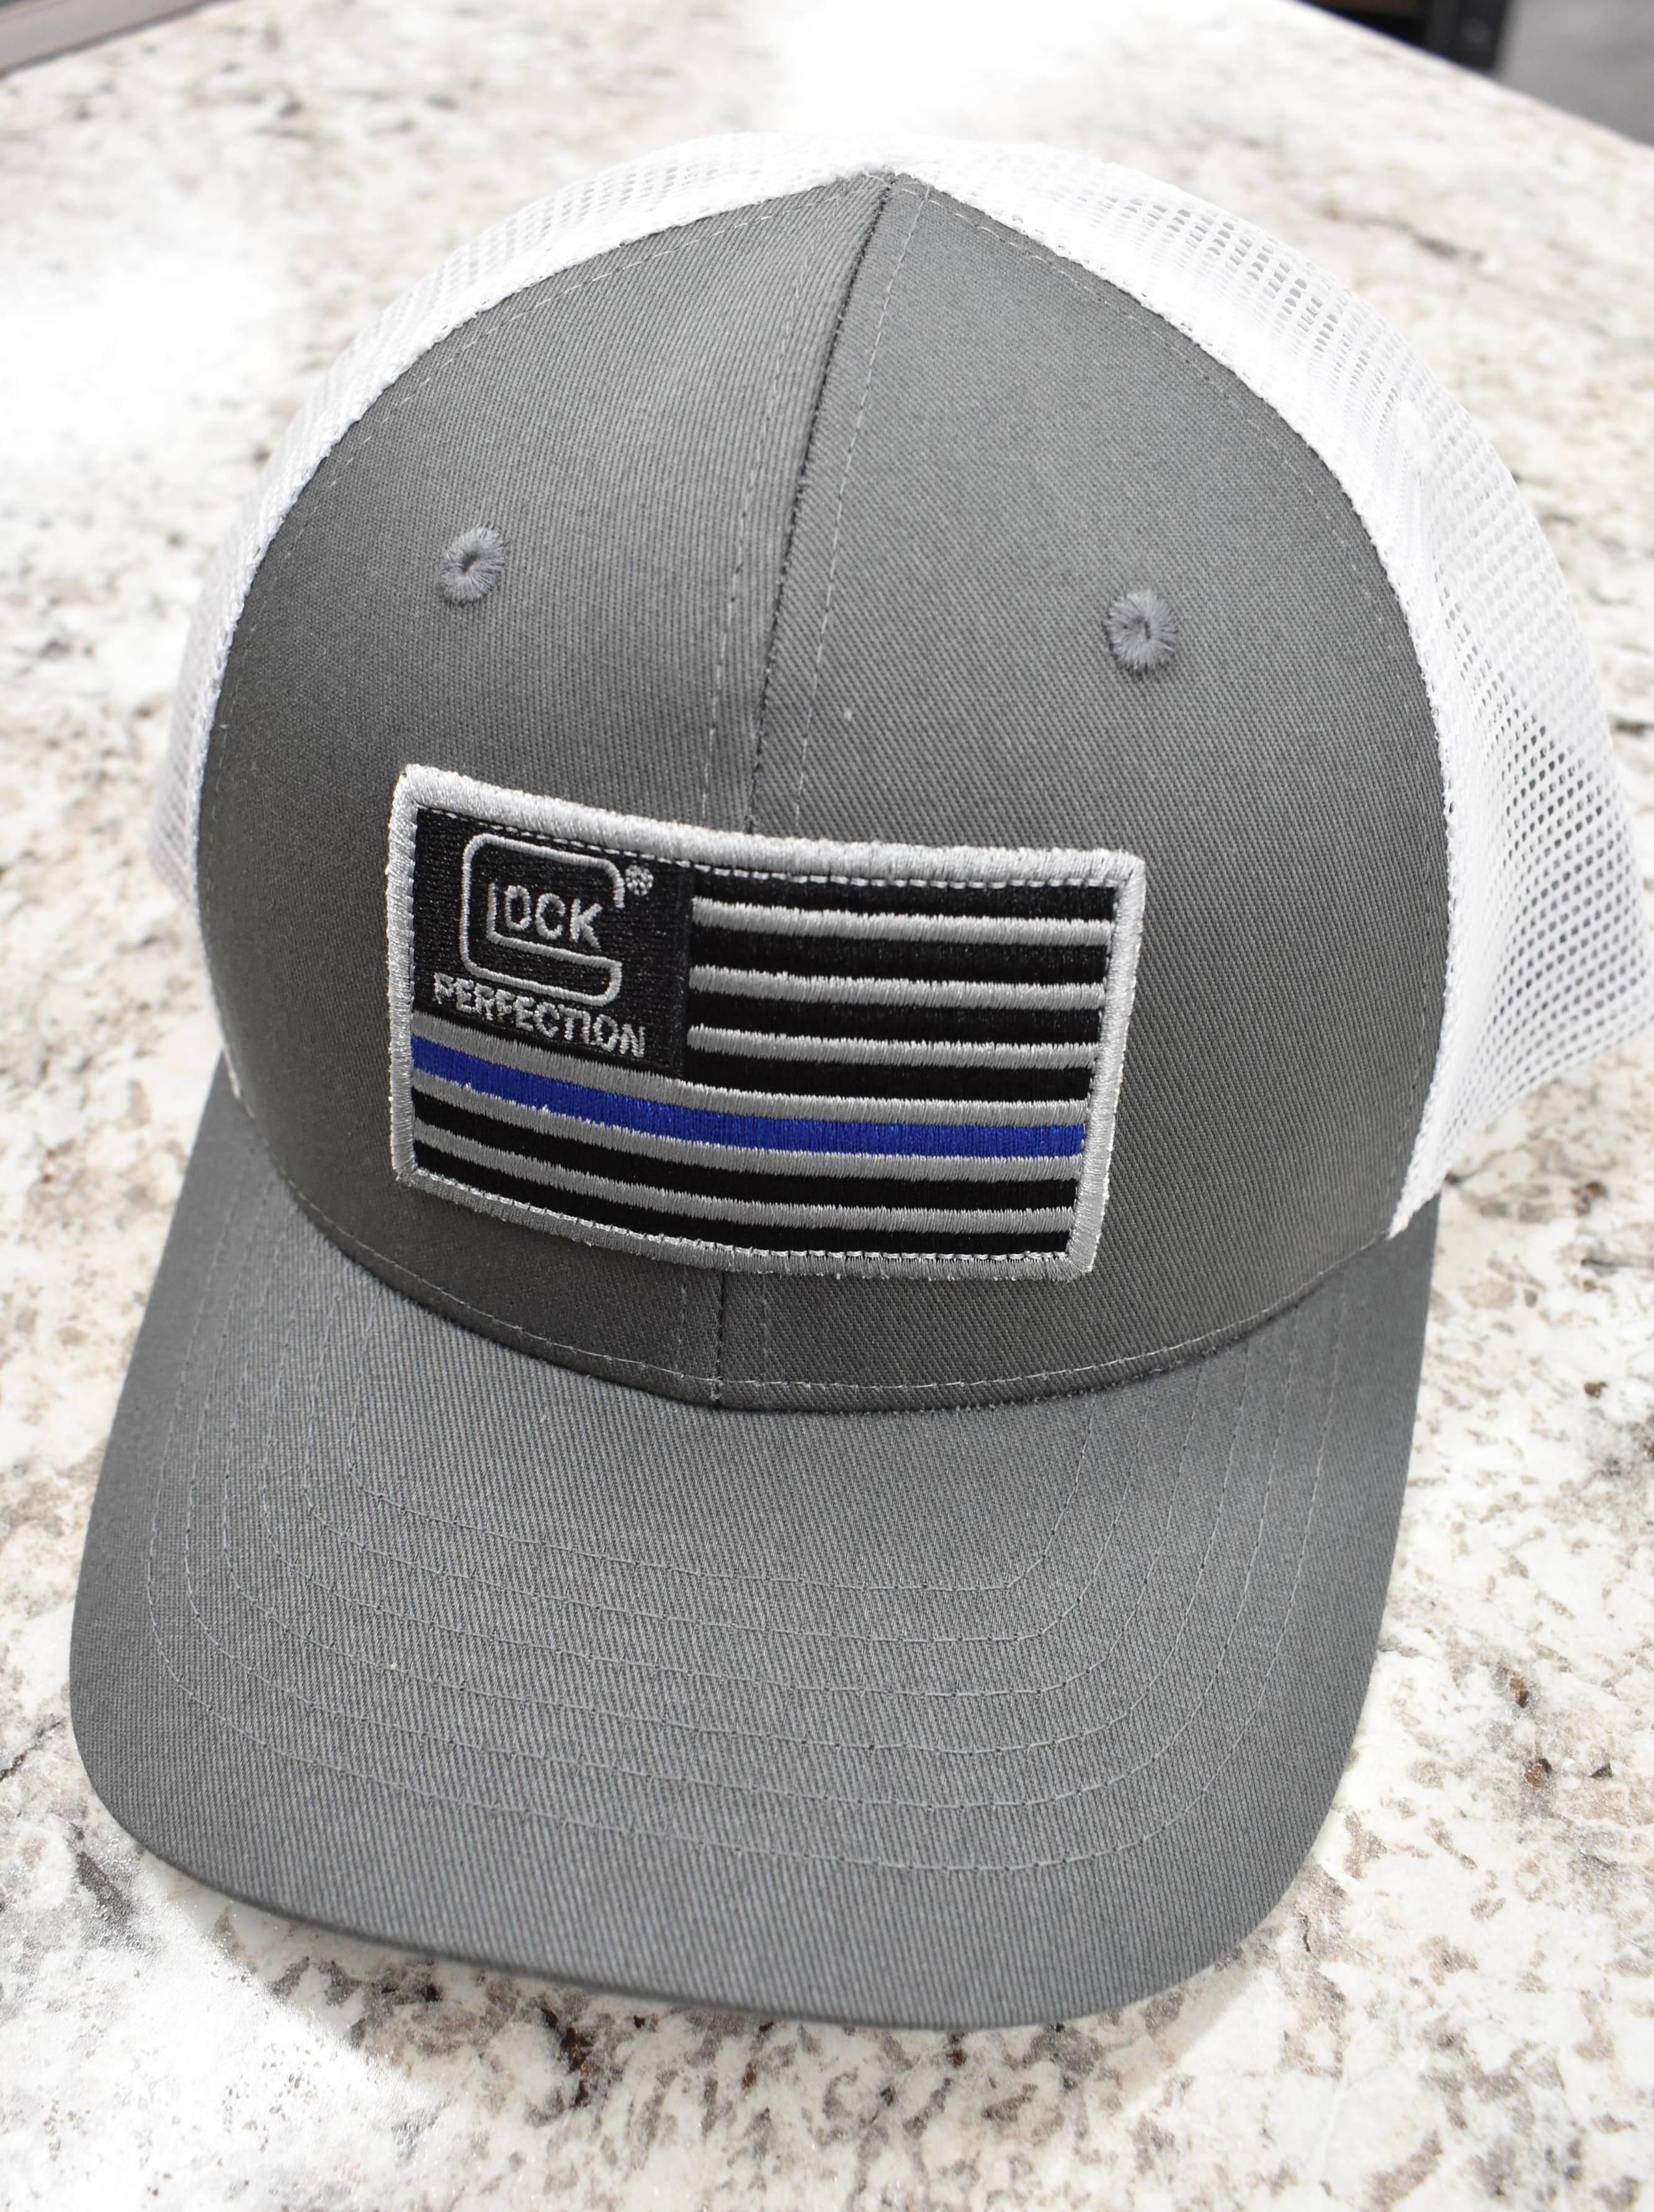 GLOCK - AS10071 - HAT CLOTHING